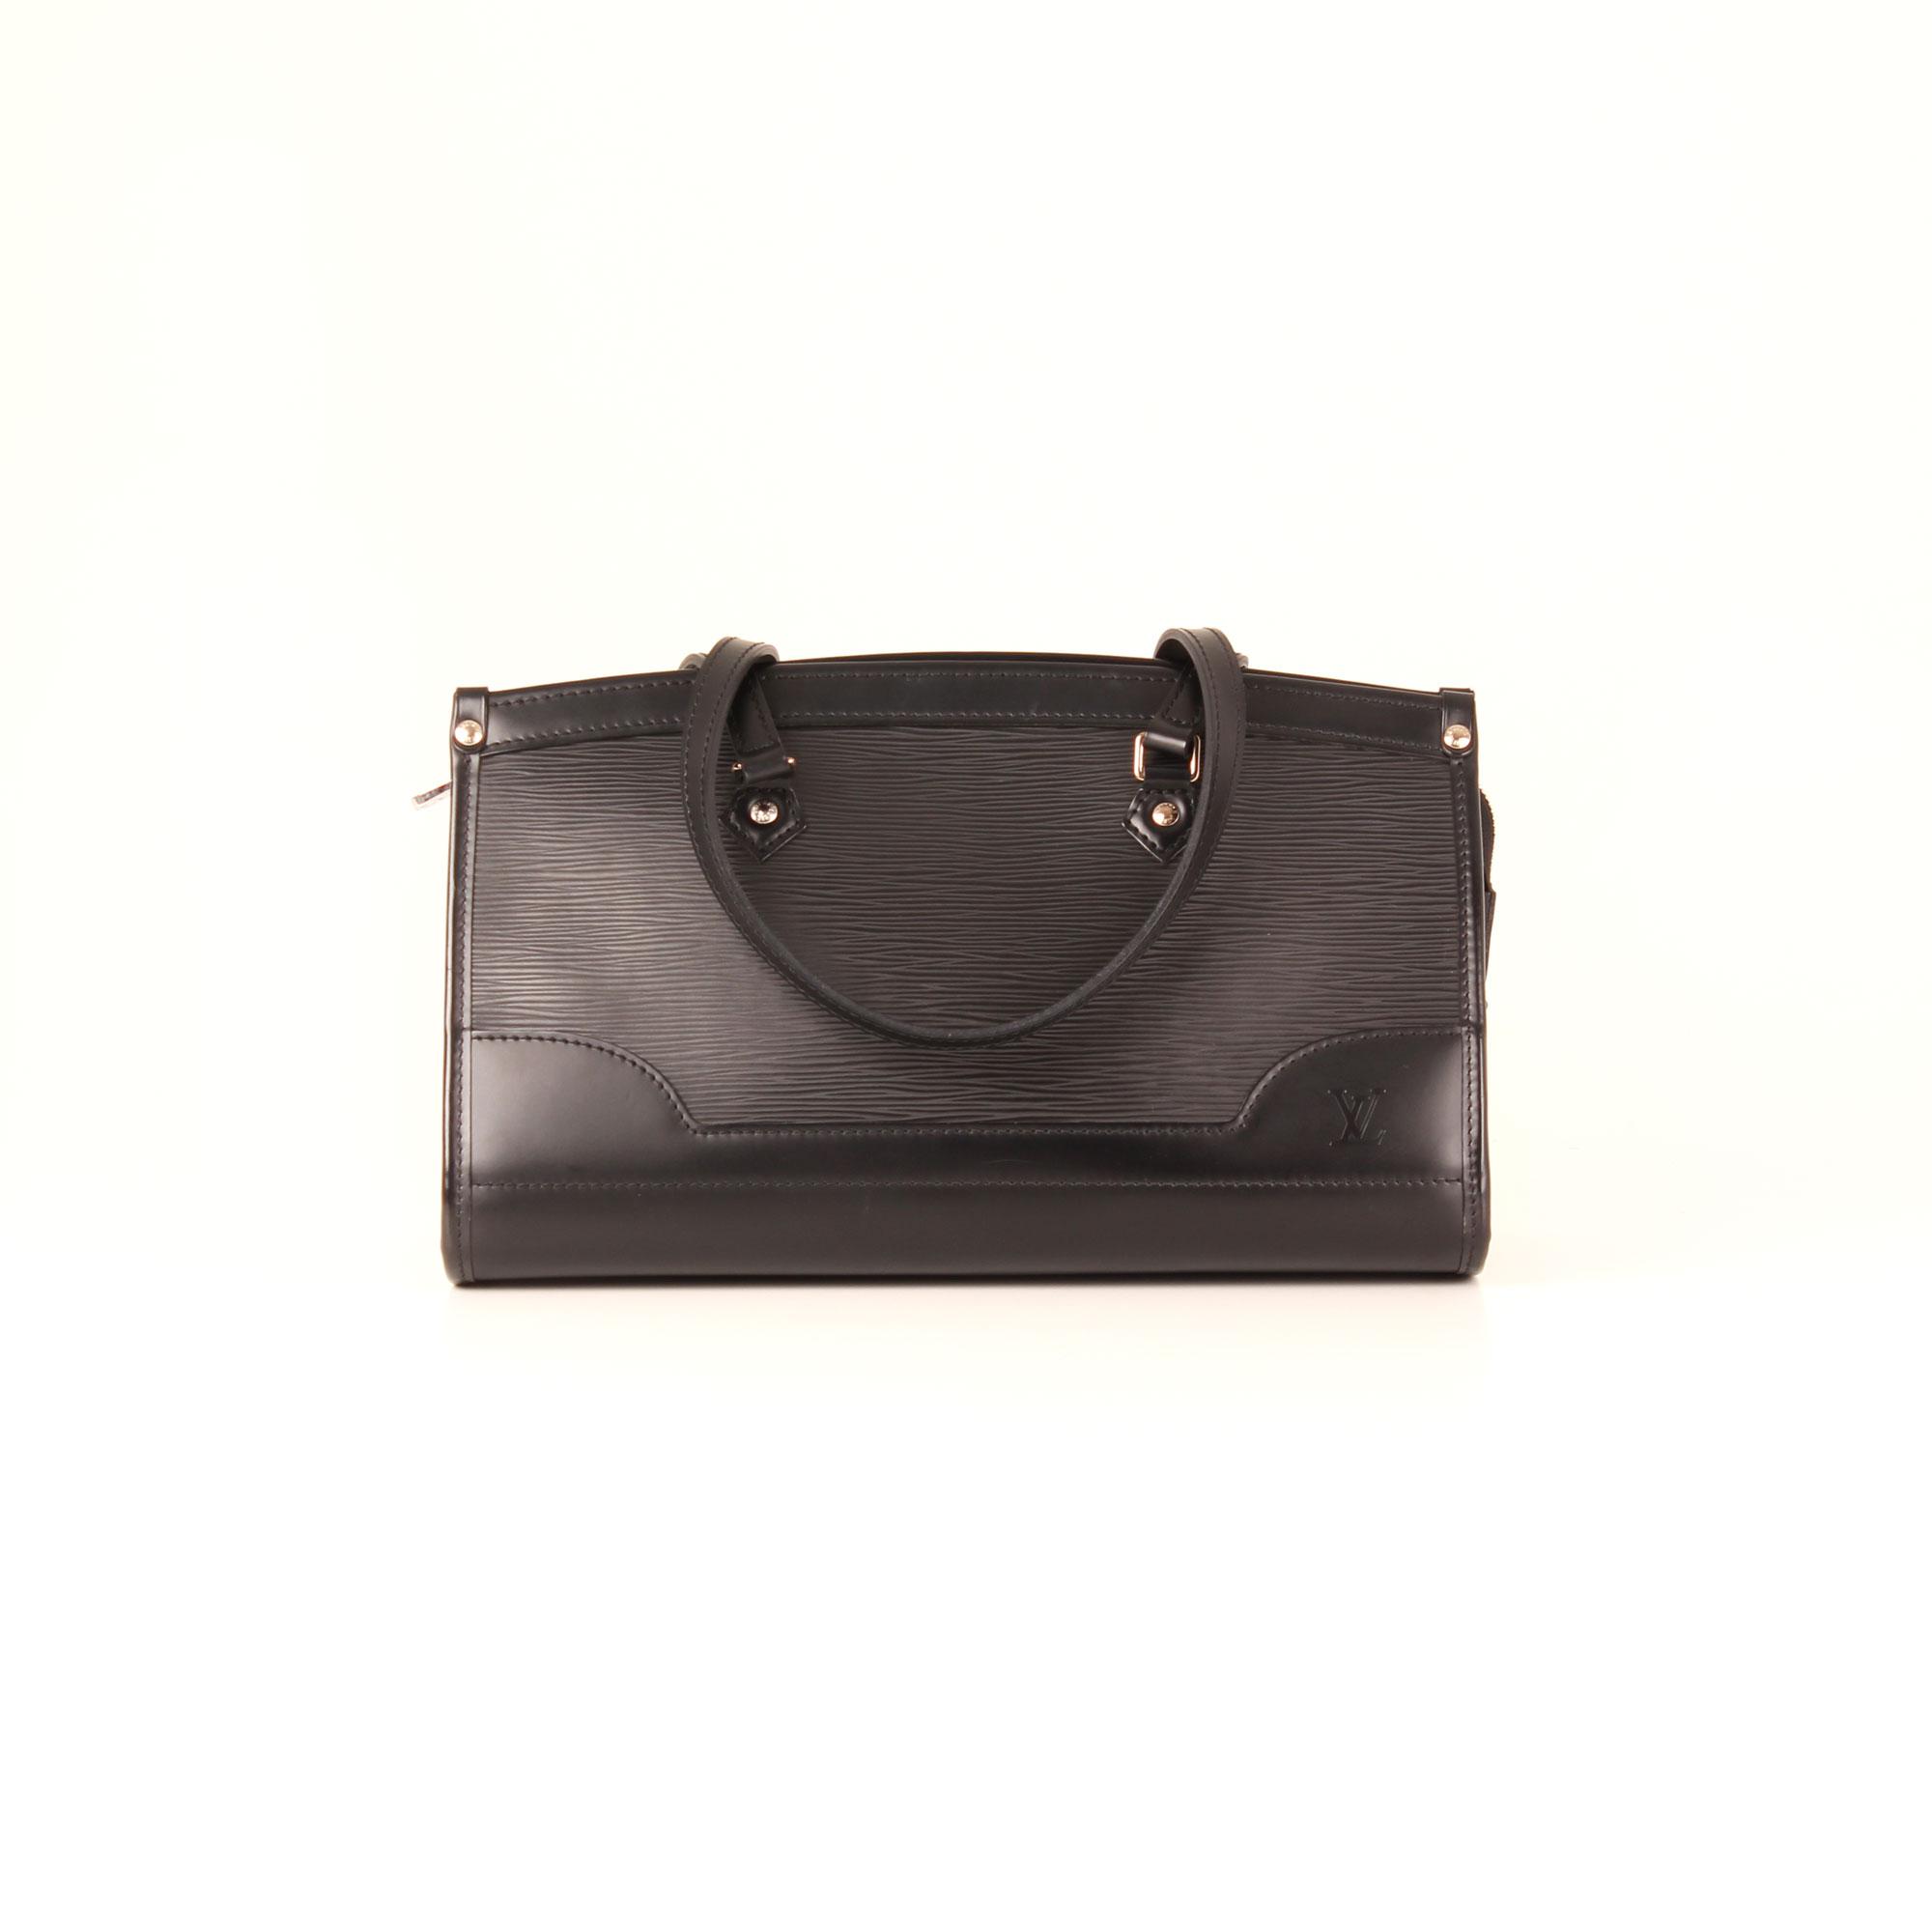 545ef9749425 Louis vuitton bag madeleine Épi black i bags jpg 2000x2000 Vuitton black louis  madeleine